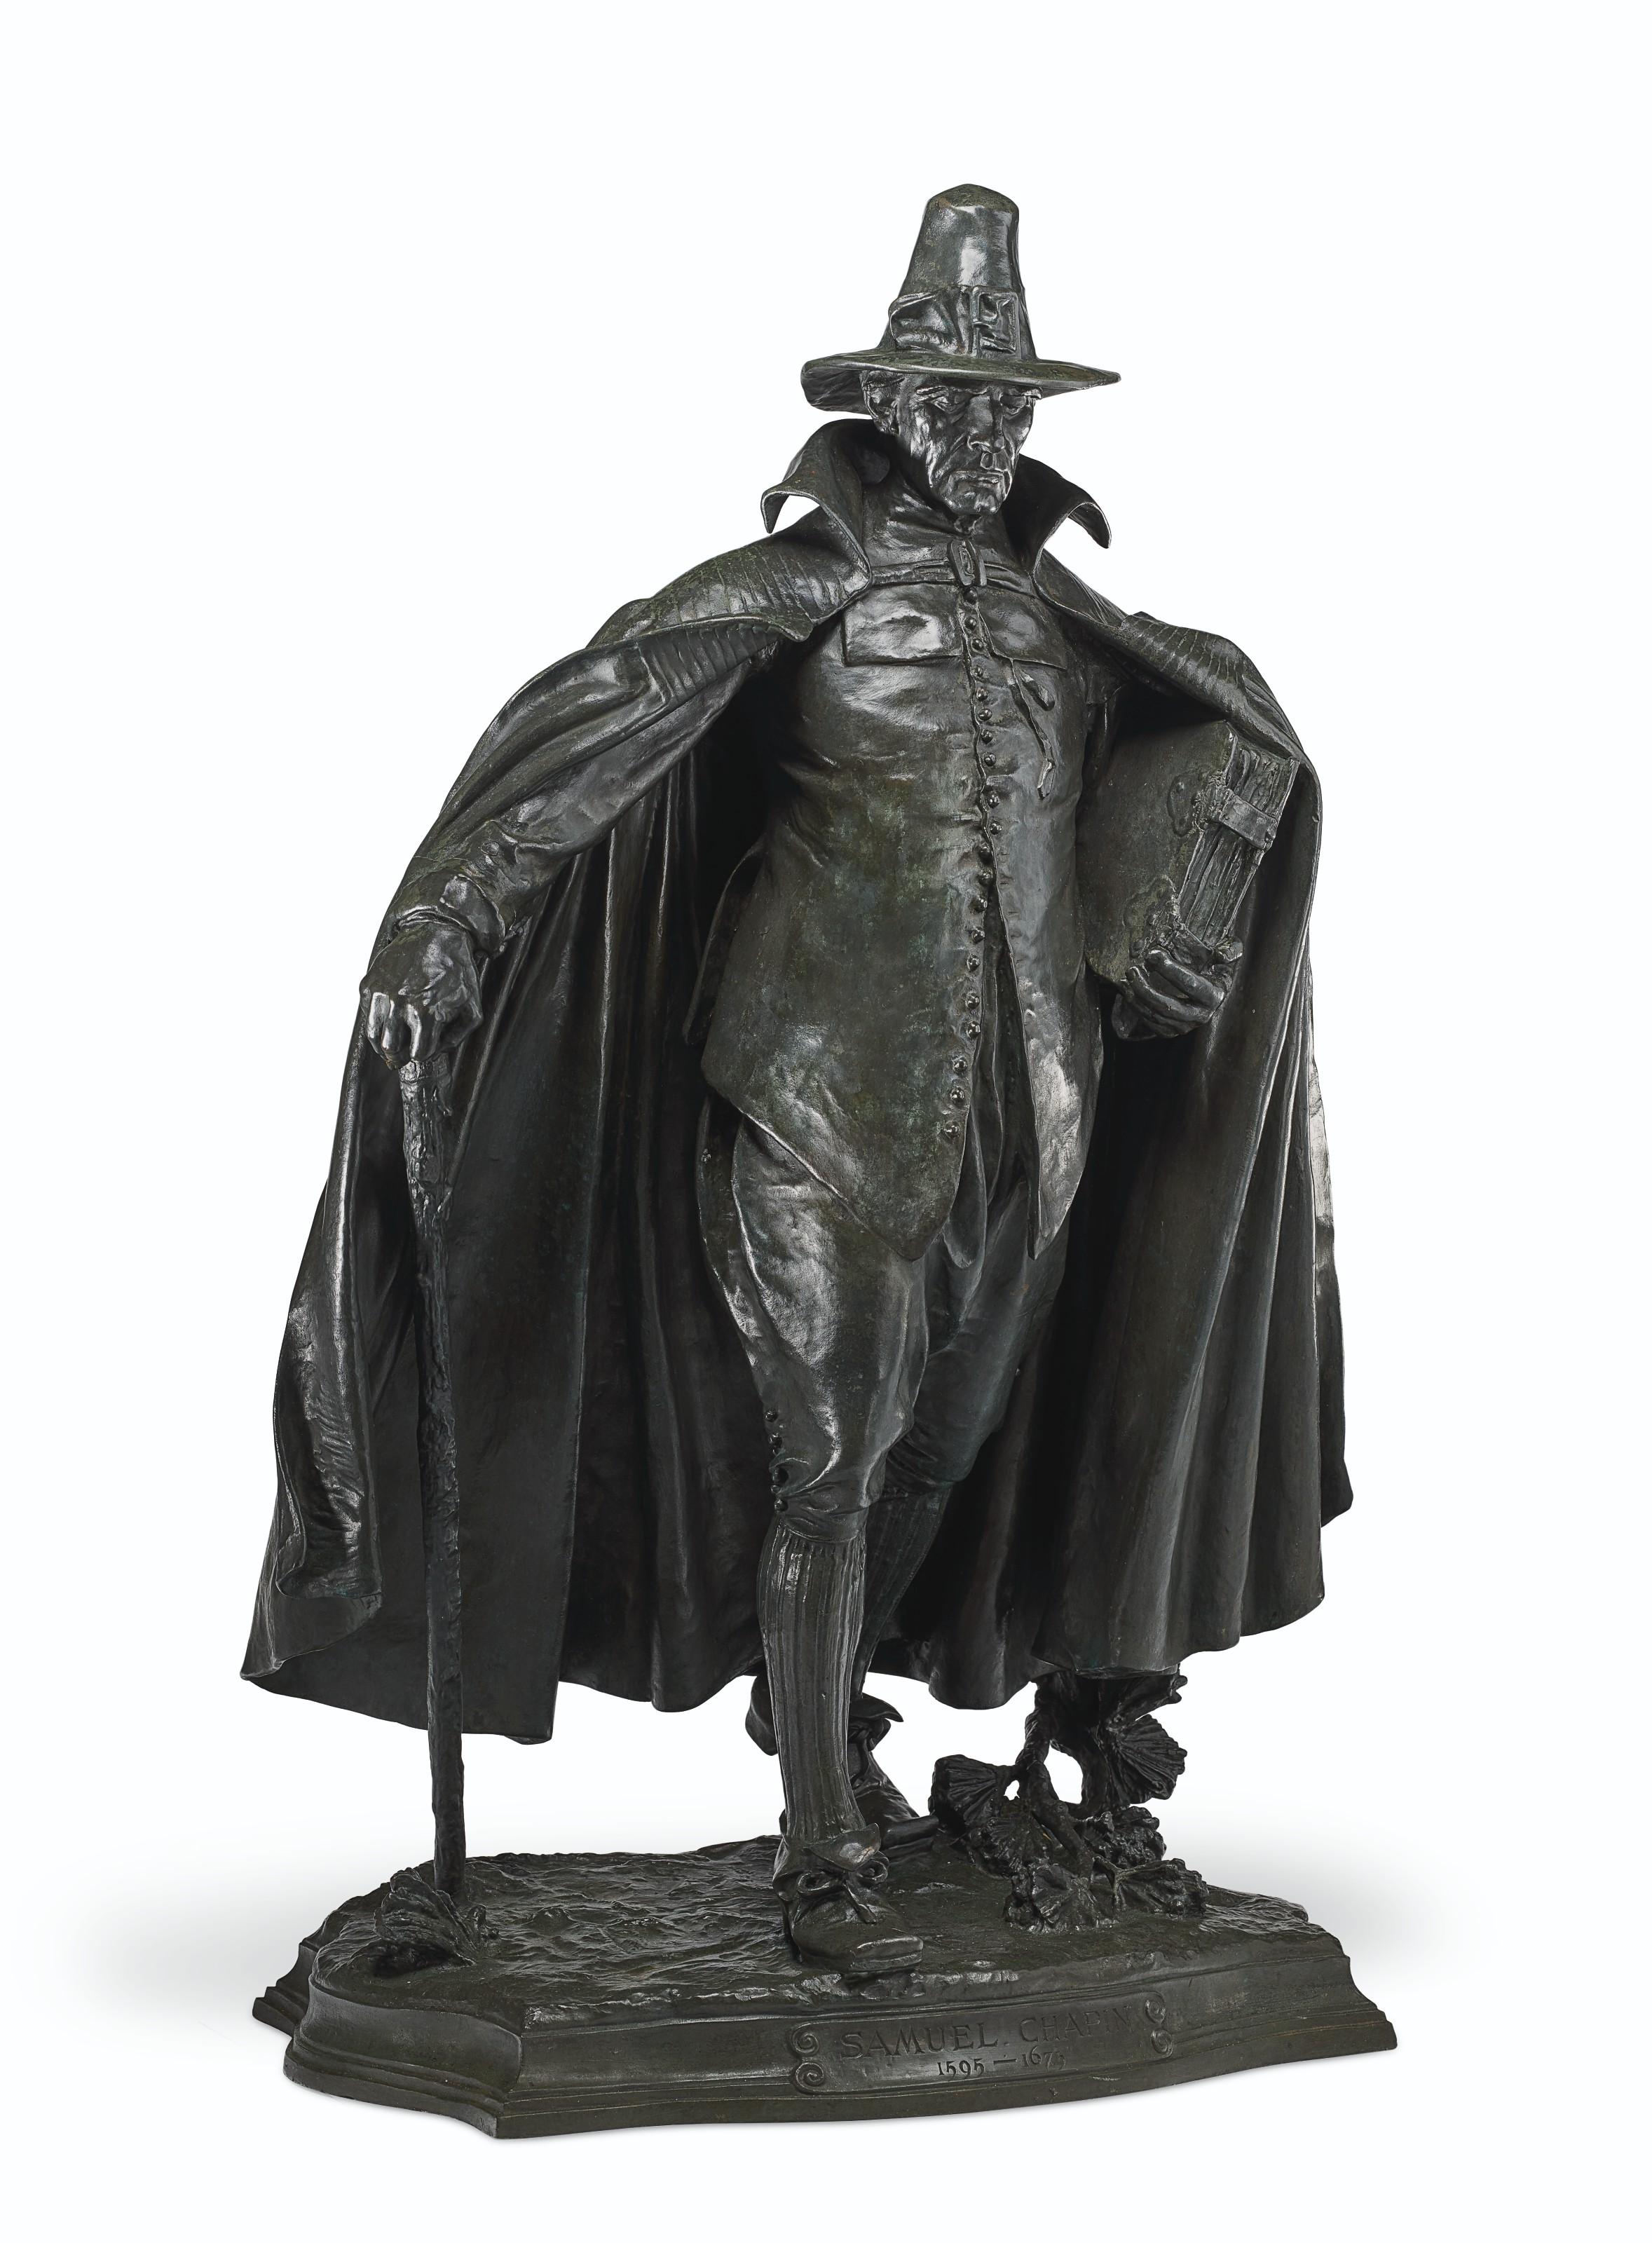 Augustus Saint-Gaudens (1848-1907)